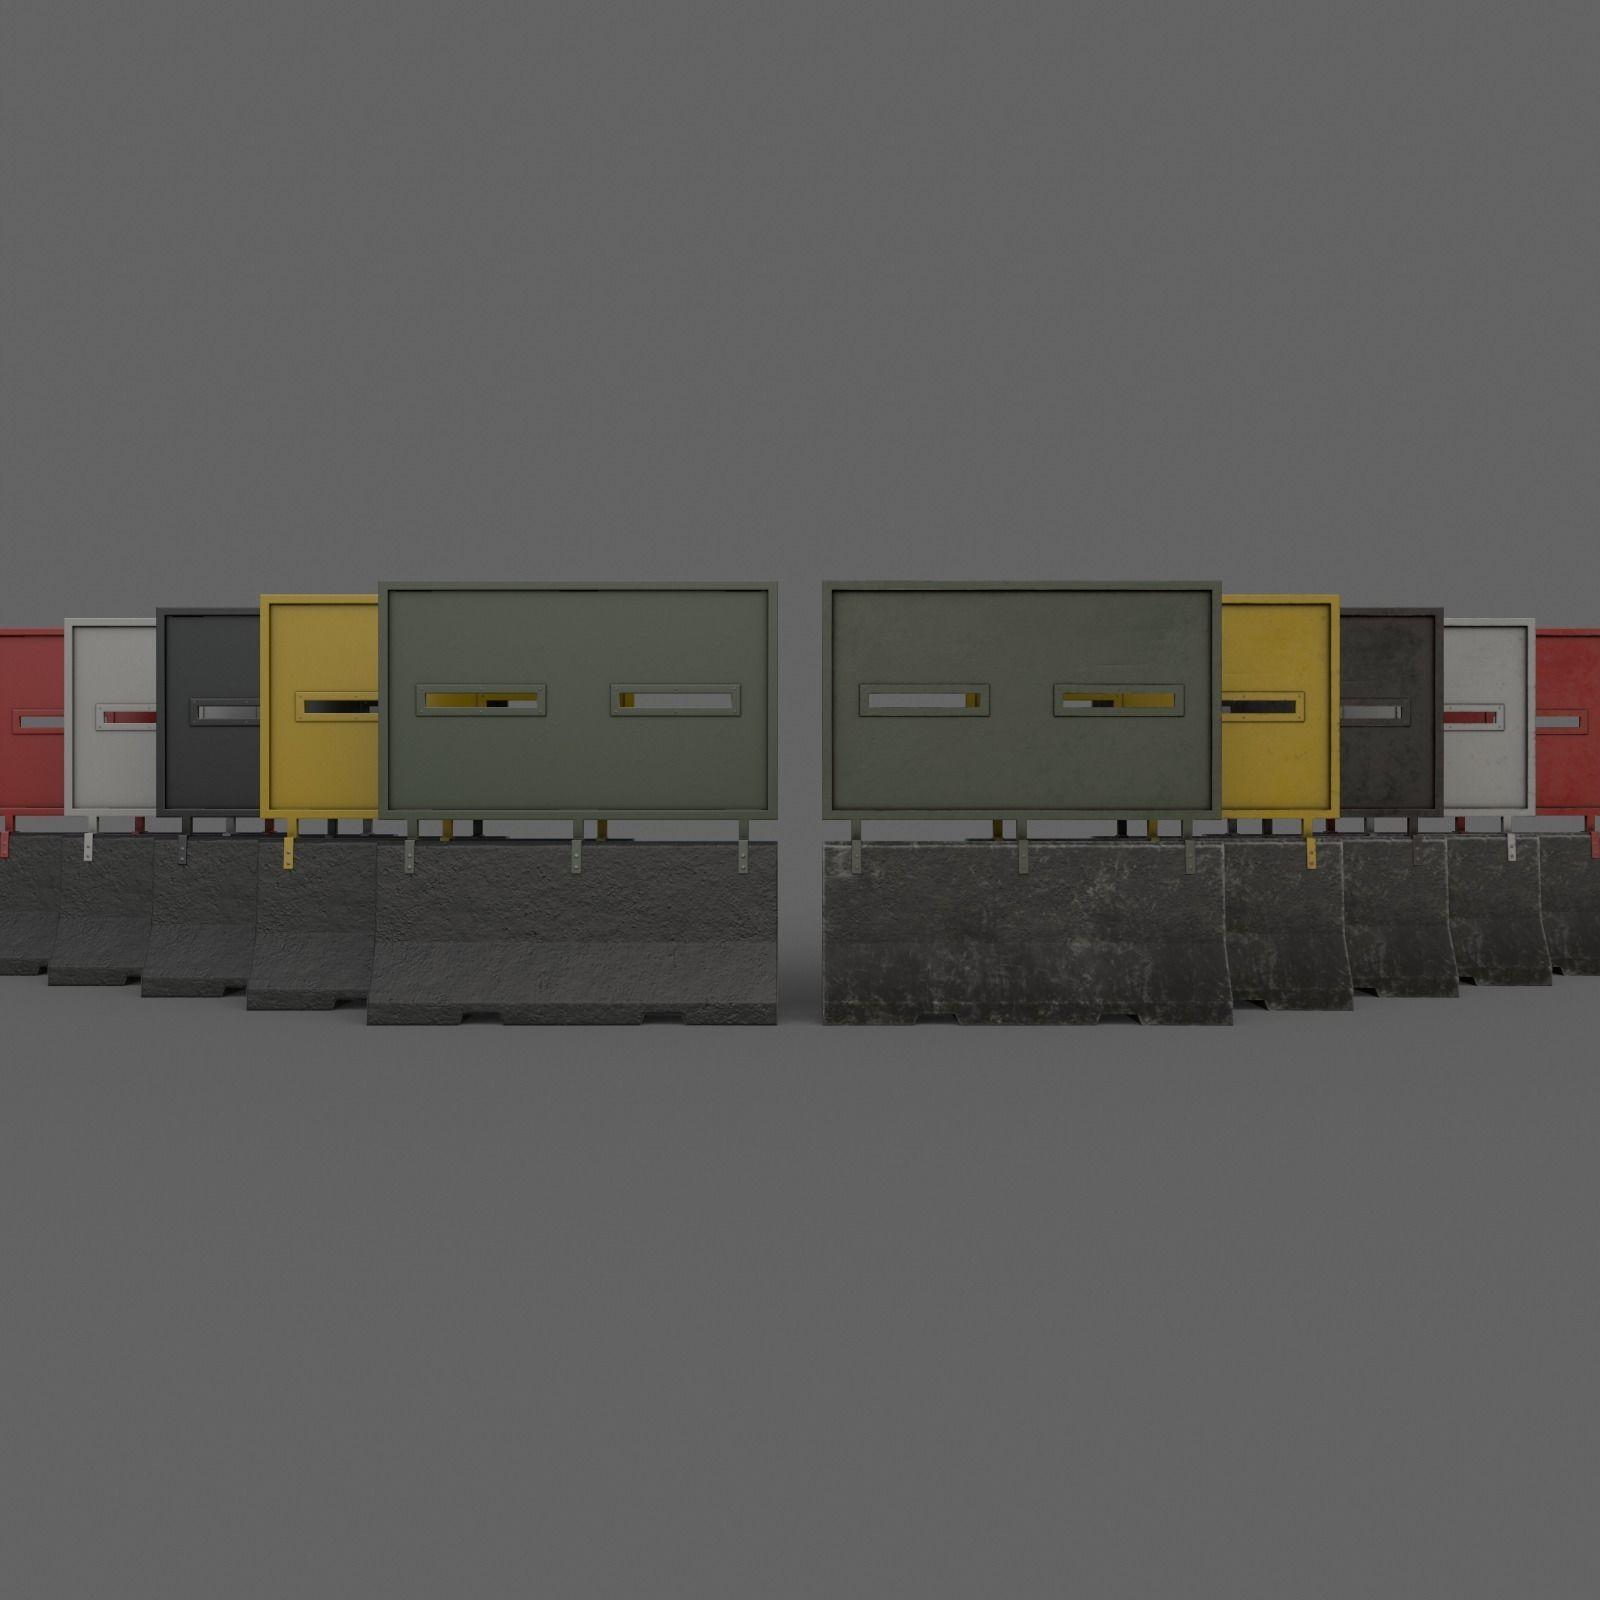 PBR Concrete Roadblock Barrier V6